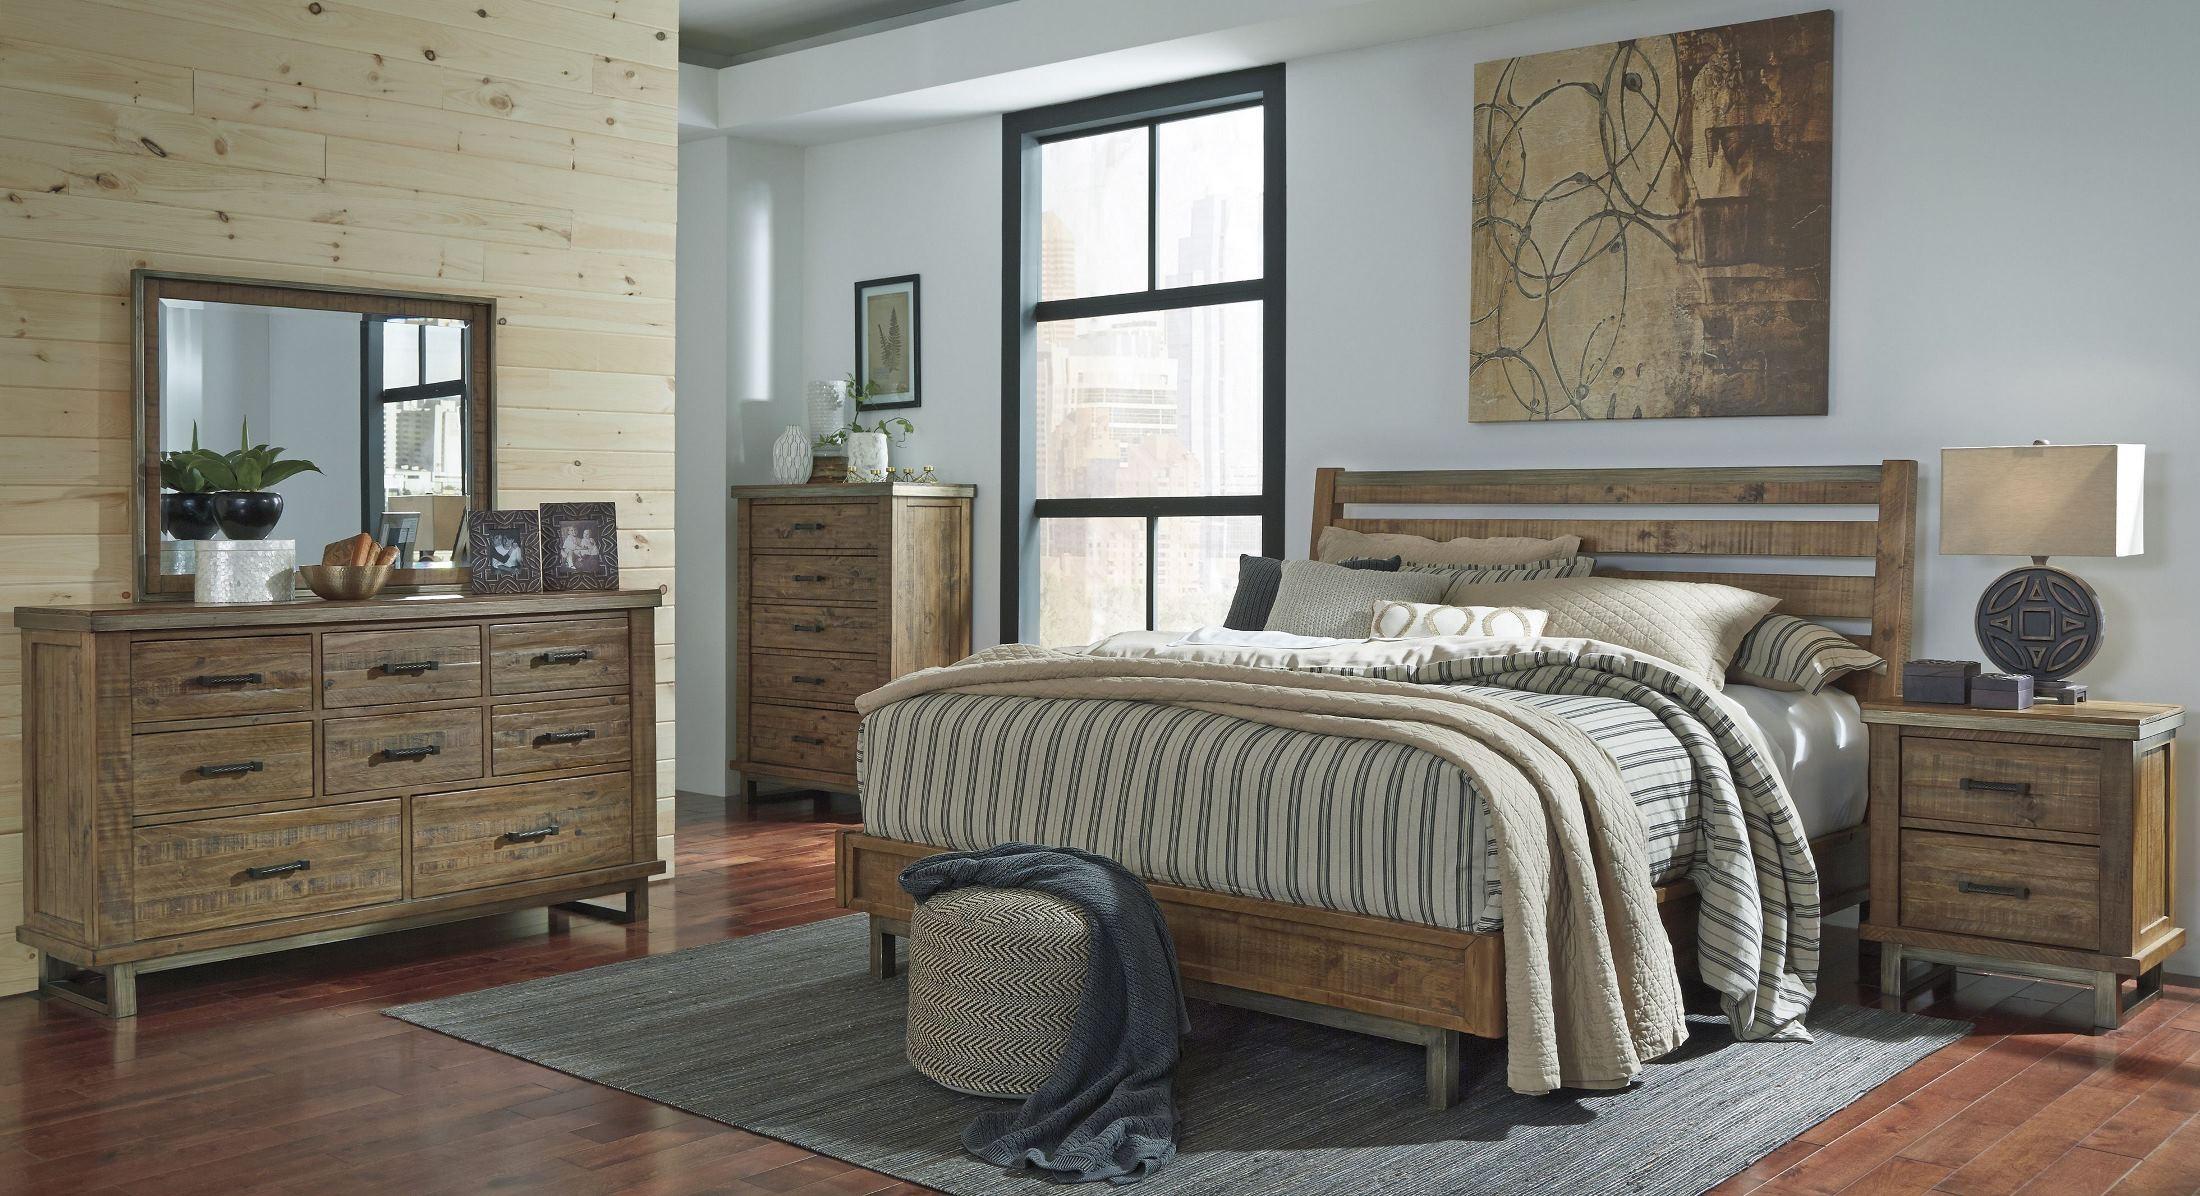 dondie warm brown platform bedroom set from ashley b663 57 54 coleman furniture